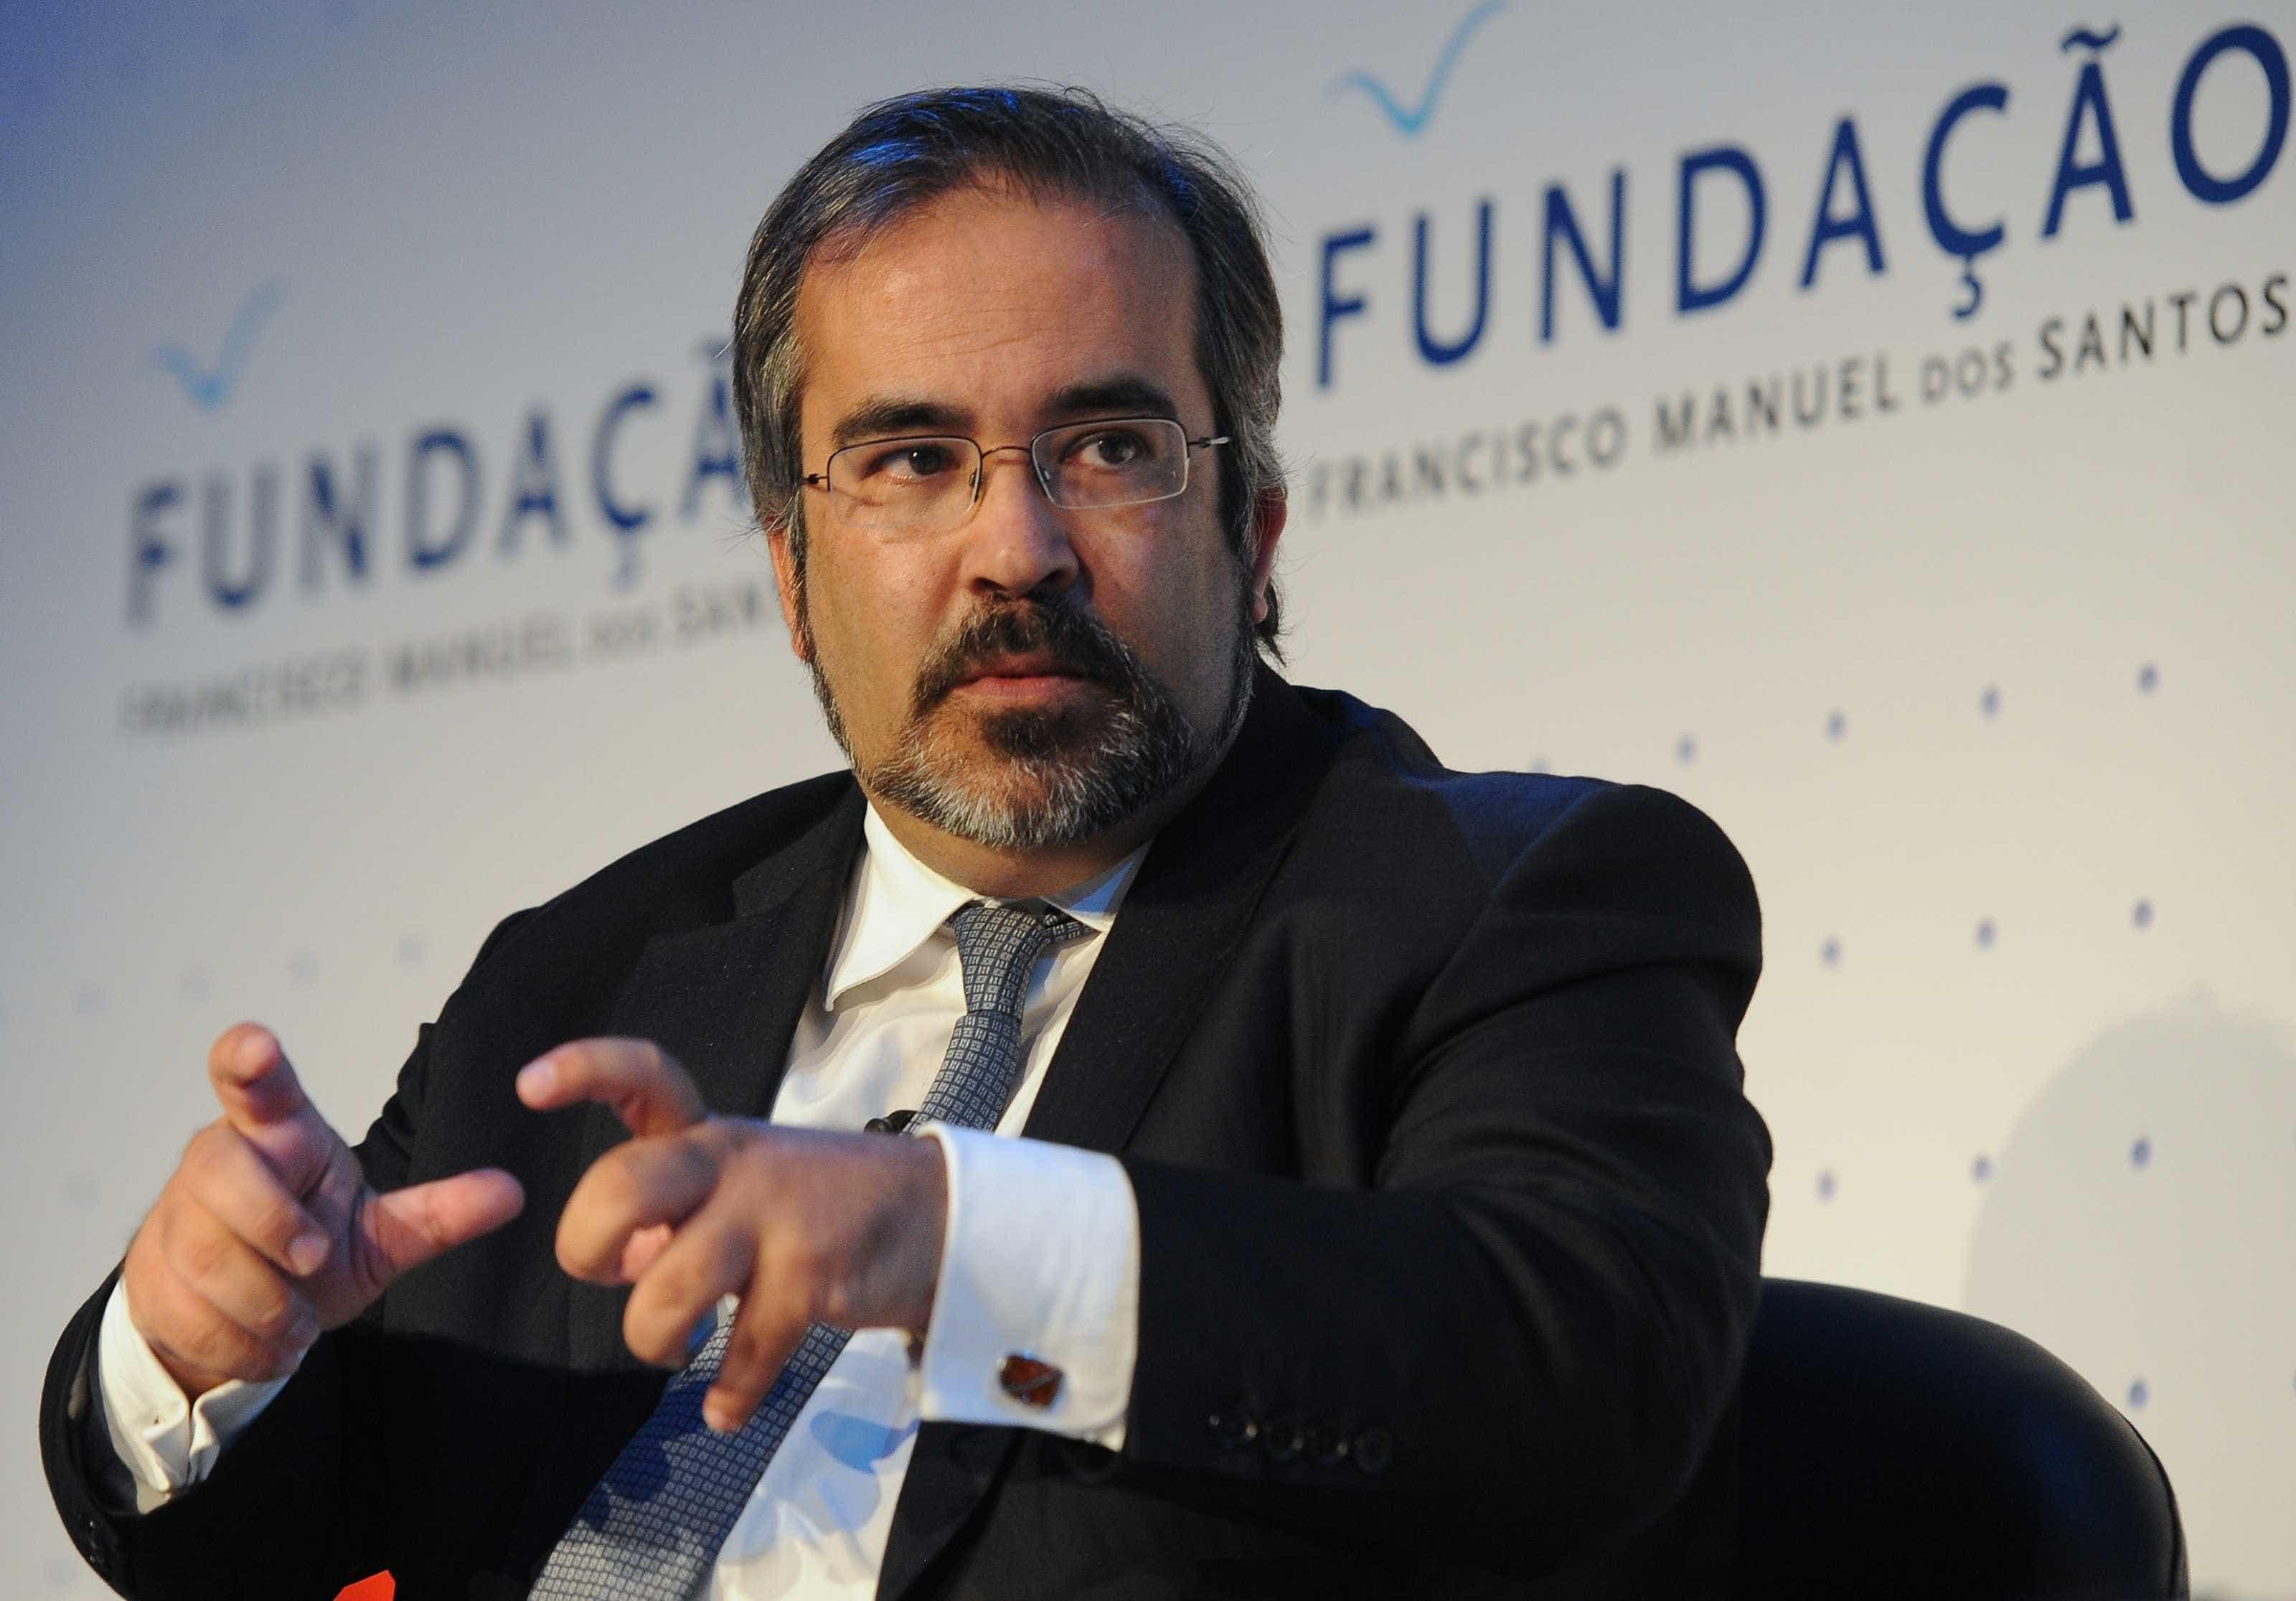 Venezuela: Paulo Rangel integra delegação que vai avaliar crise